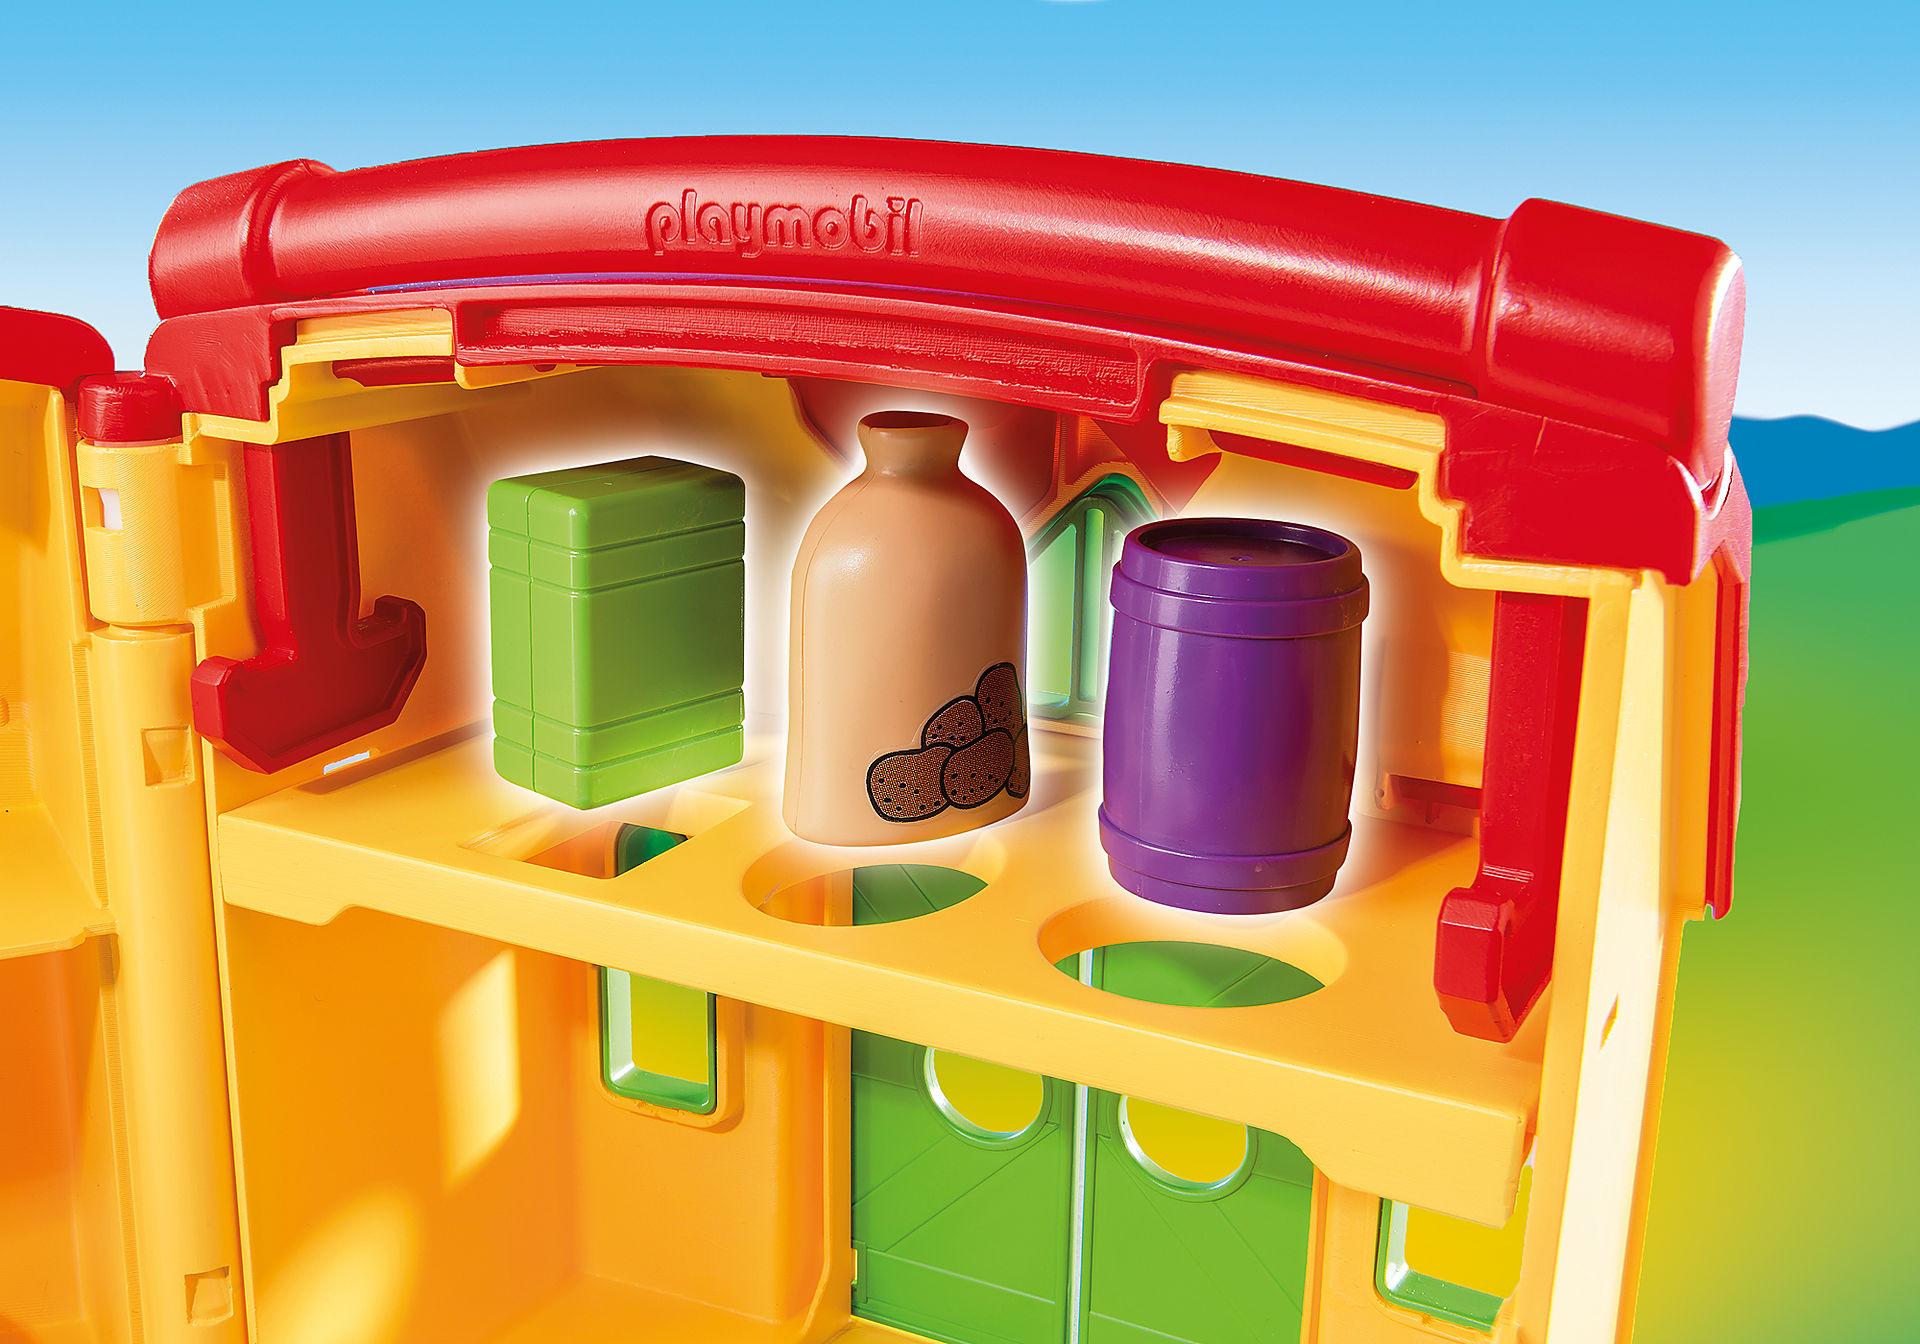 http://media.playmobil.com/i/playmobil/6962_product_extra1/Ferme transportable avec animaux